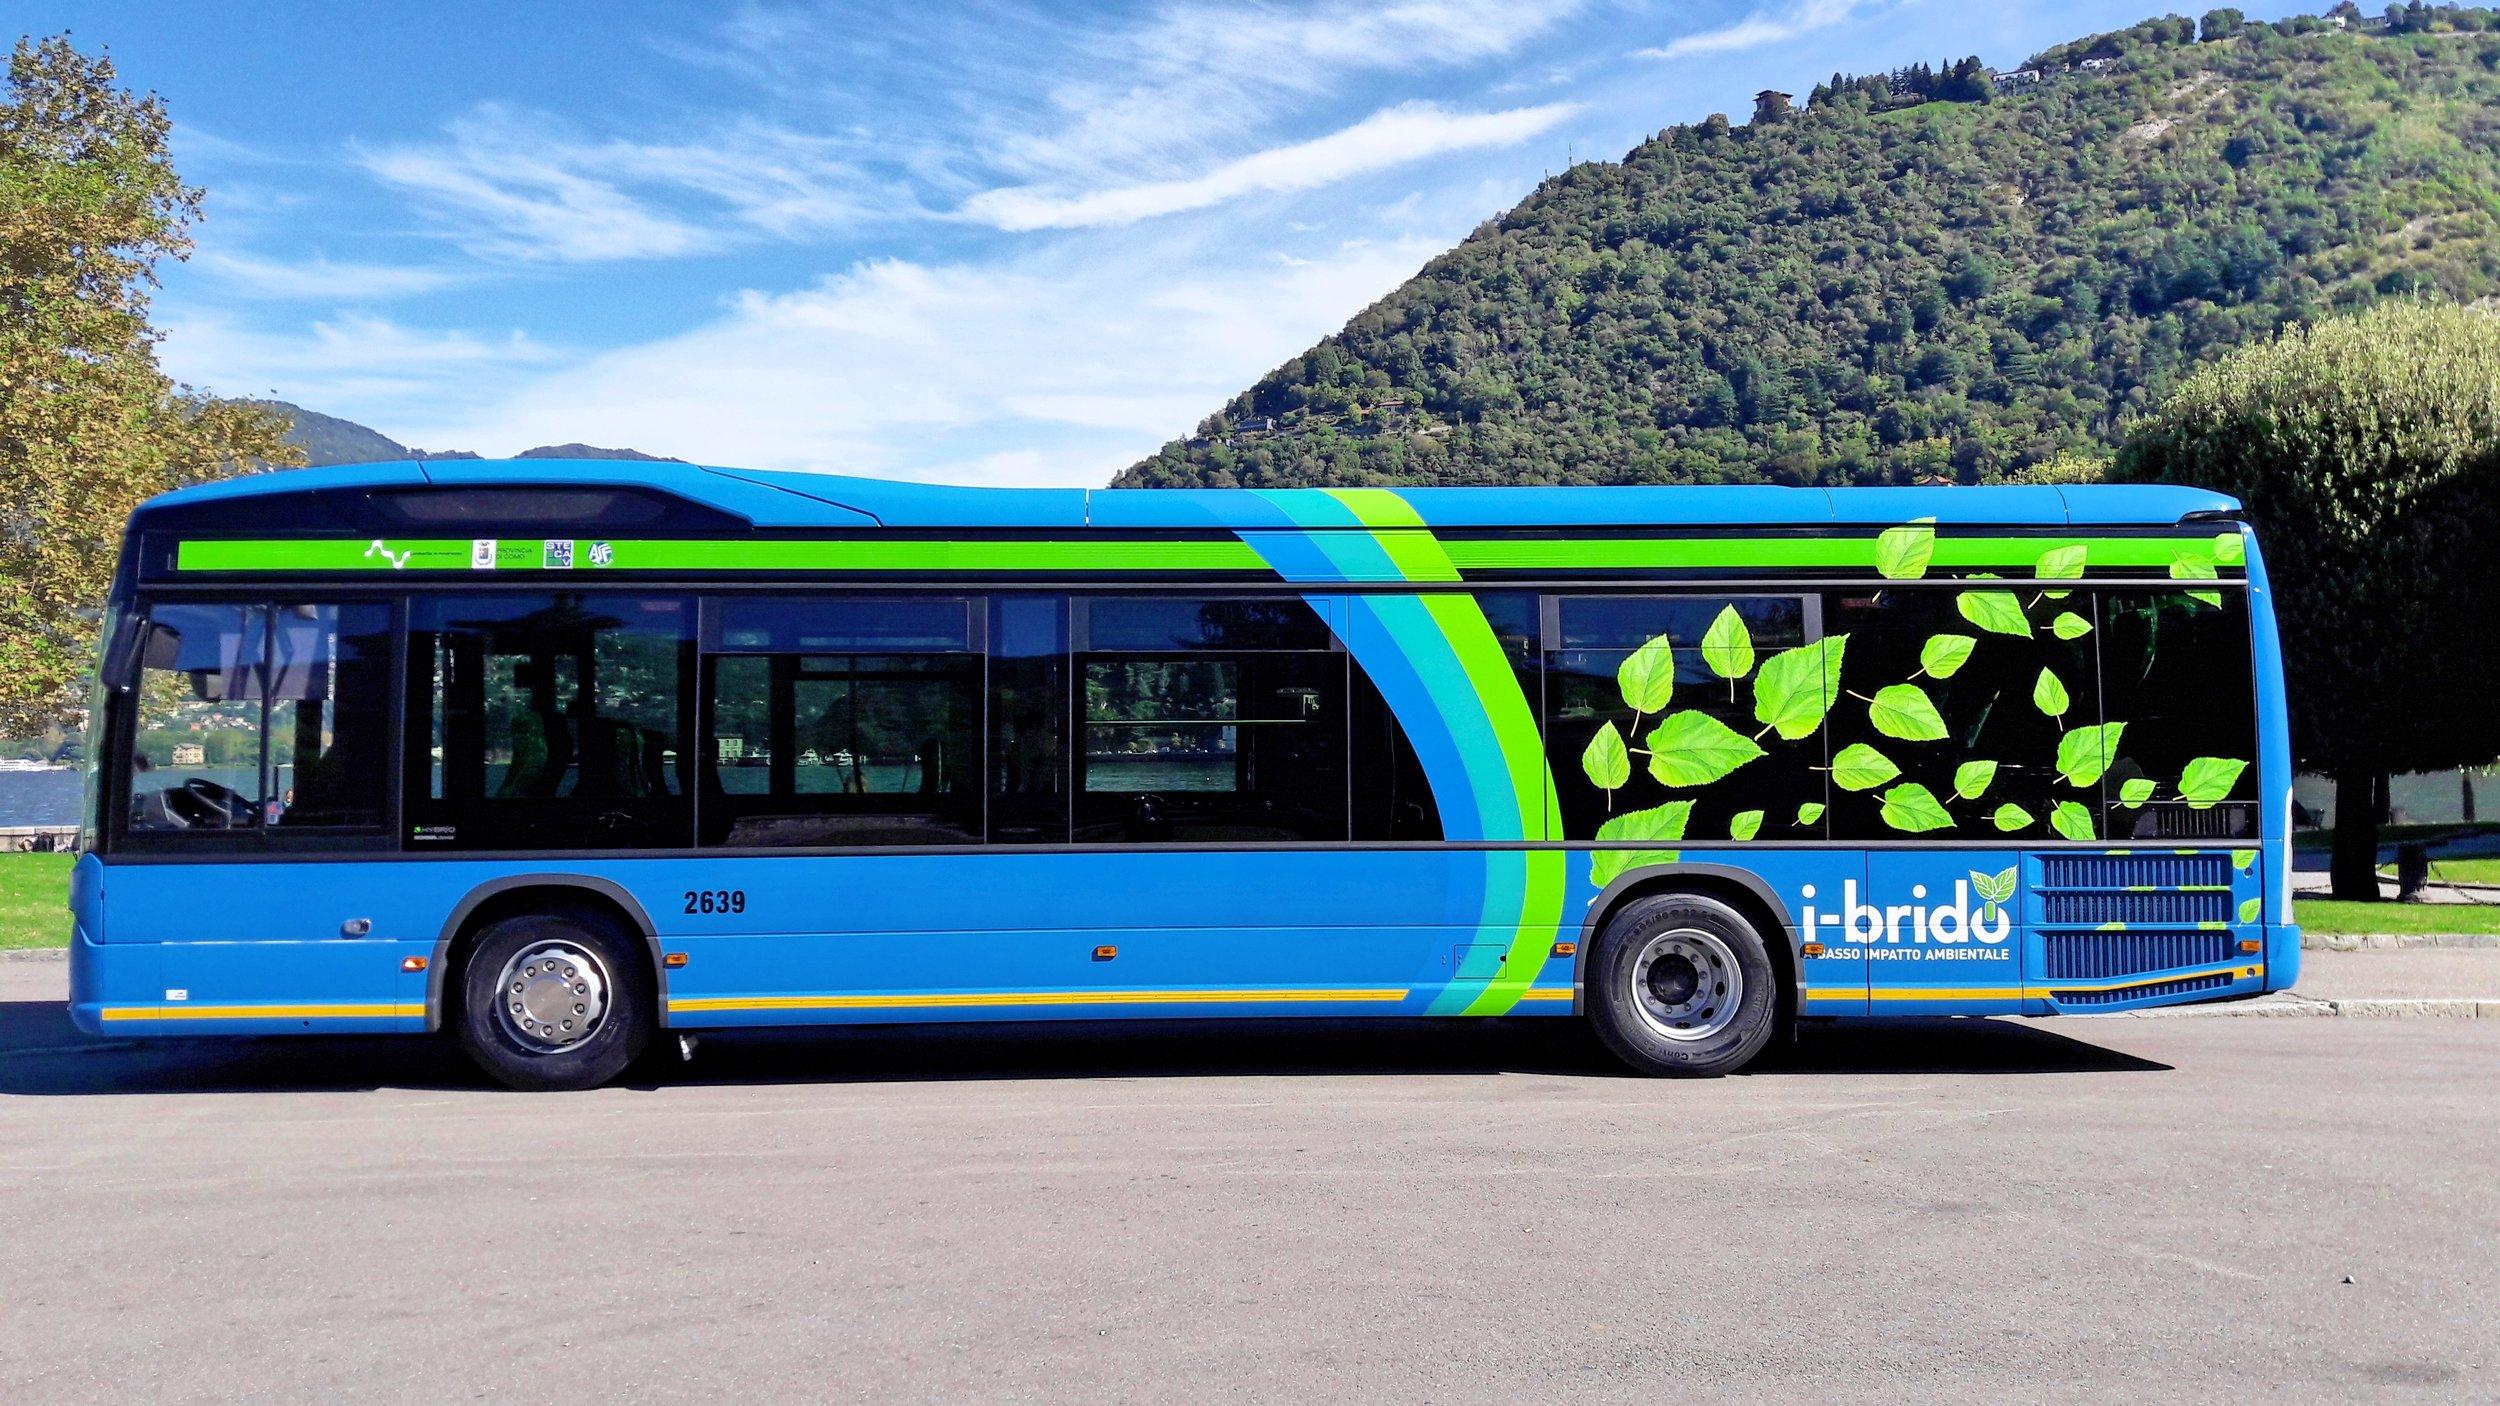 A typical ASF blue bus (Image via www.trasporti-italia.com)